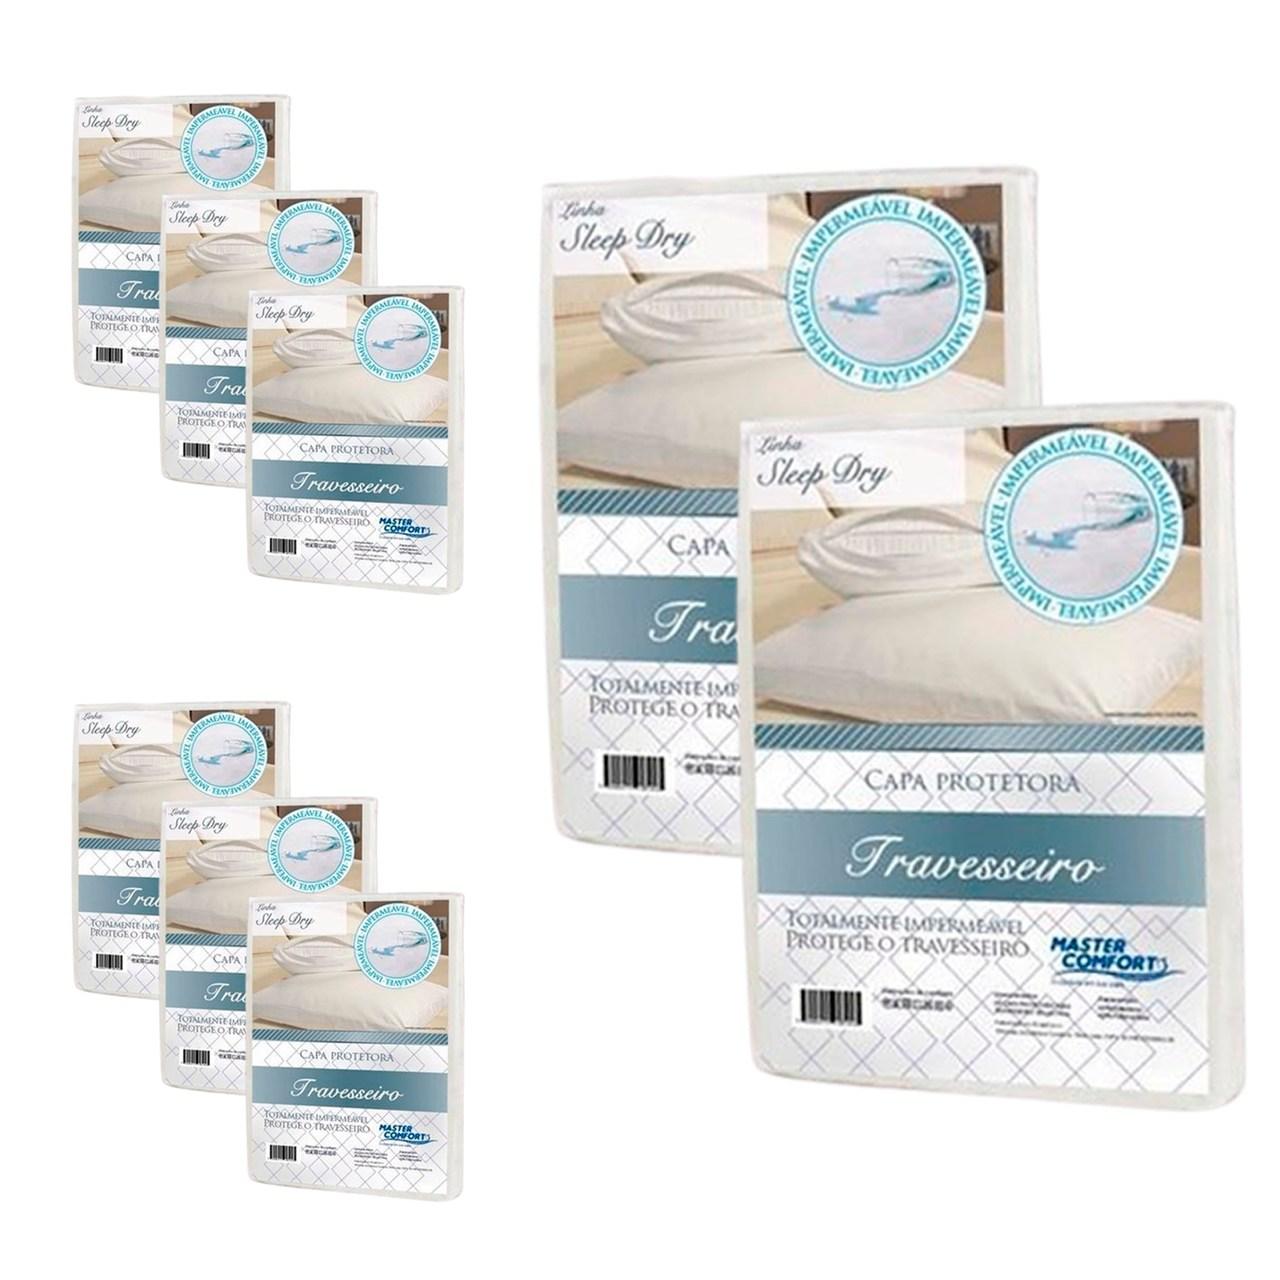 KIT 8 Capas Protetora Impermeável de Travesseiro Sleep Dry